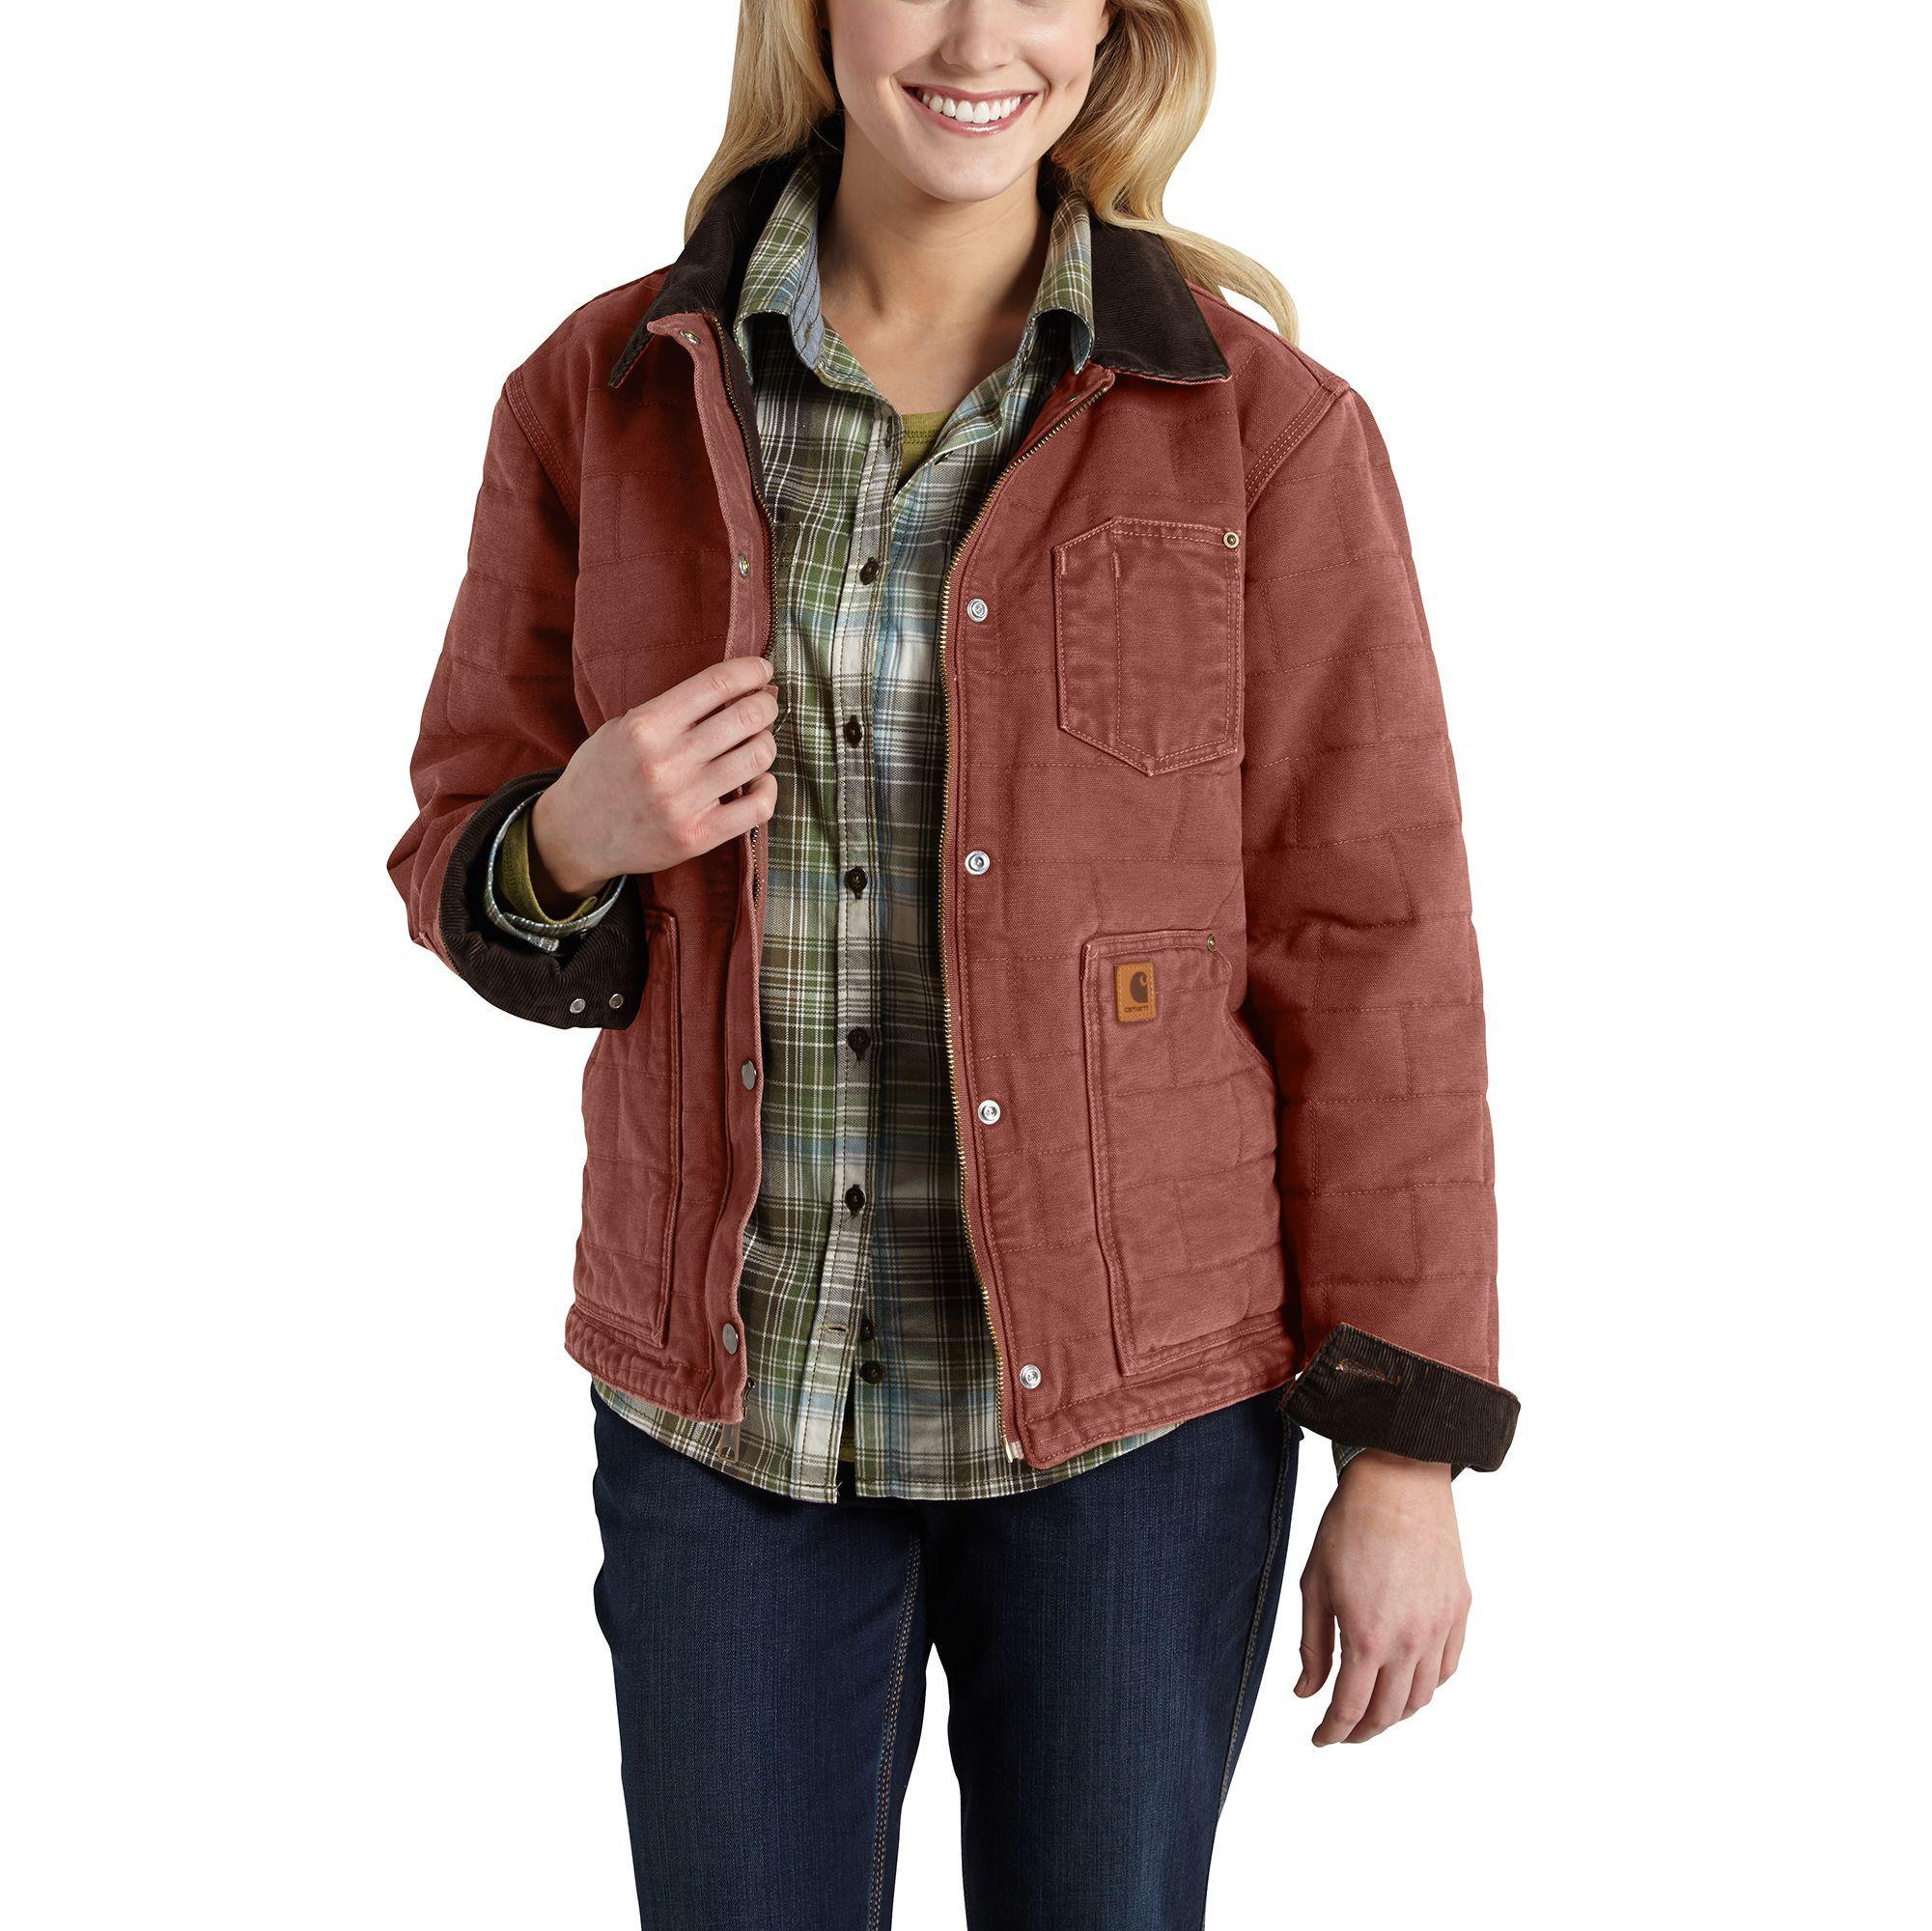 carhartt Vintage jacket rose